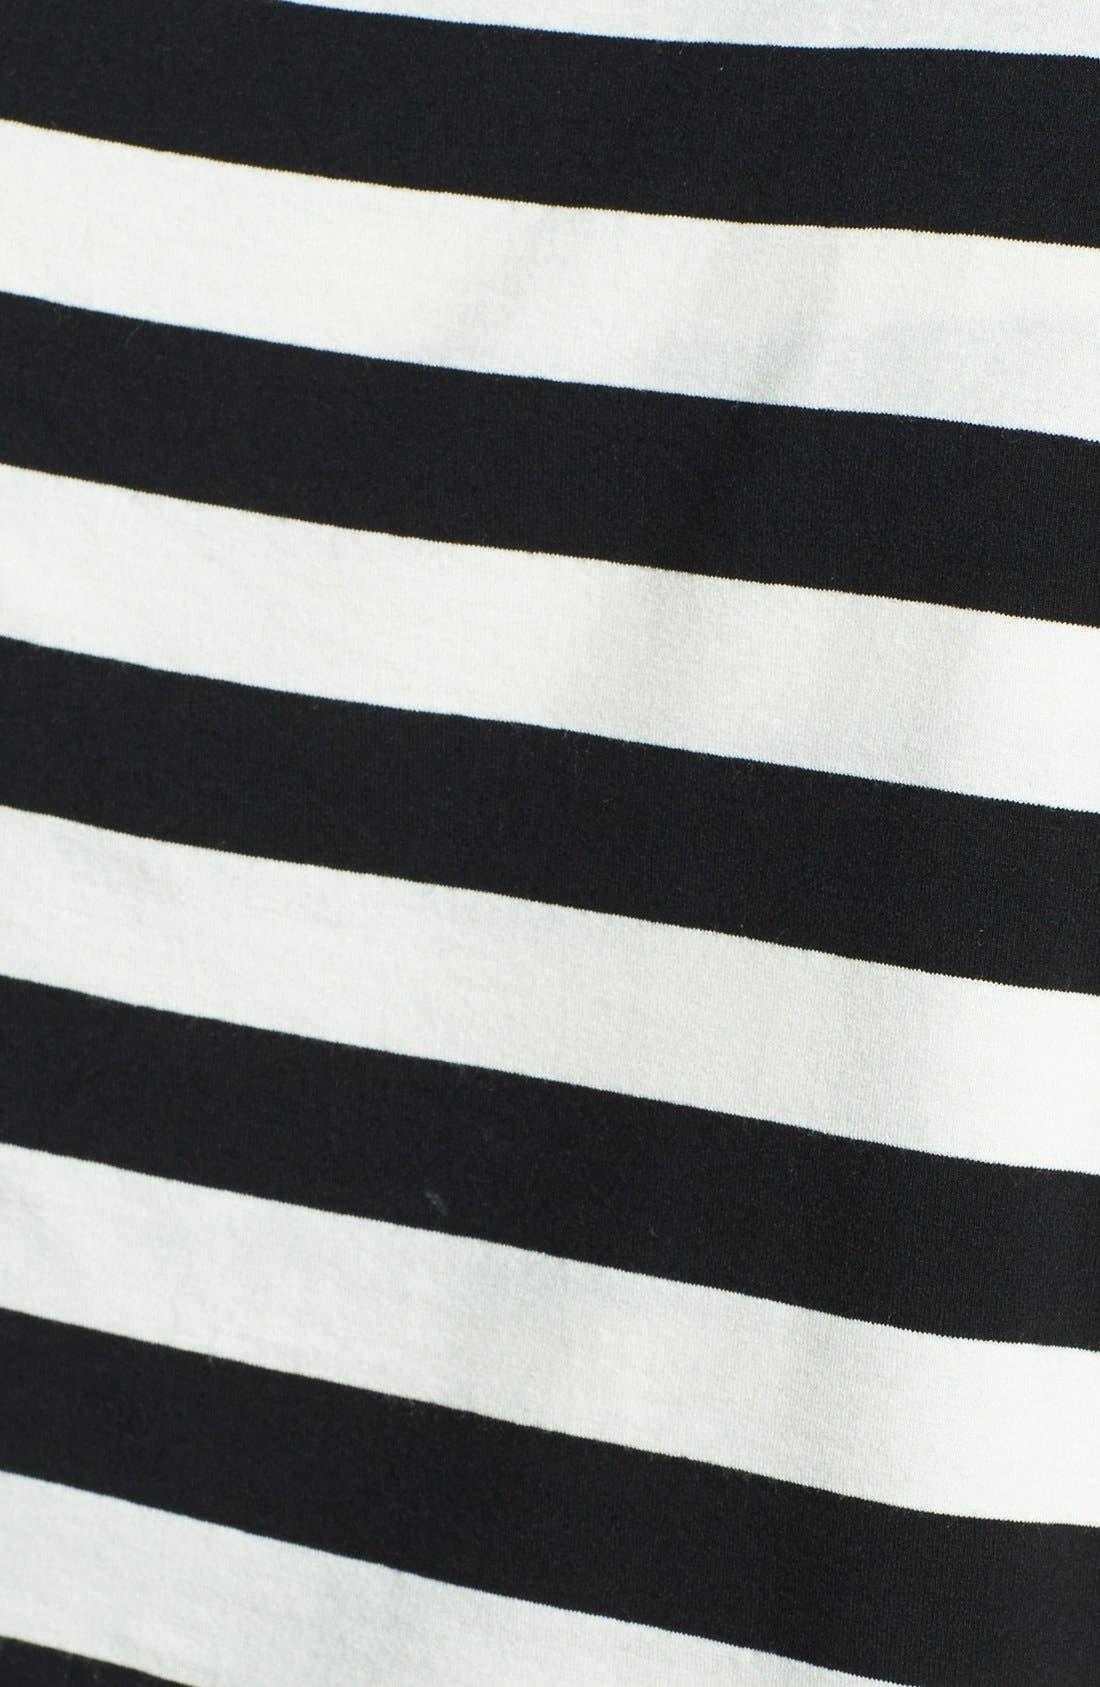 Alternate Image 3  - Vince Camuto Stripe Bandage Top (Plus Size)